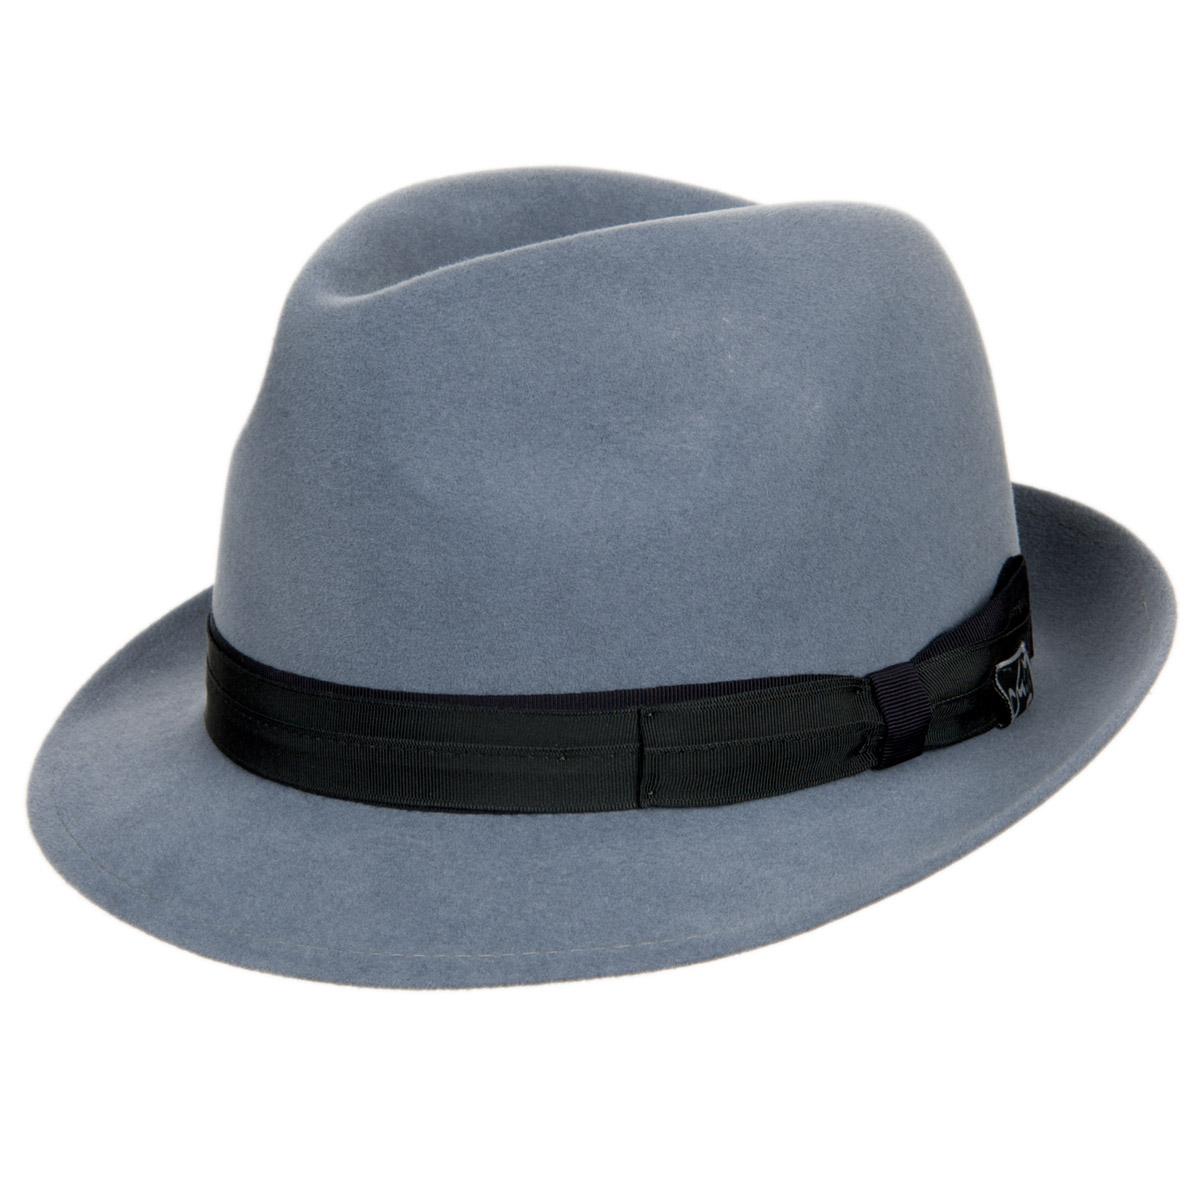 Cappelli da uomo foto